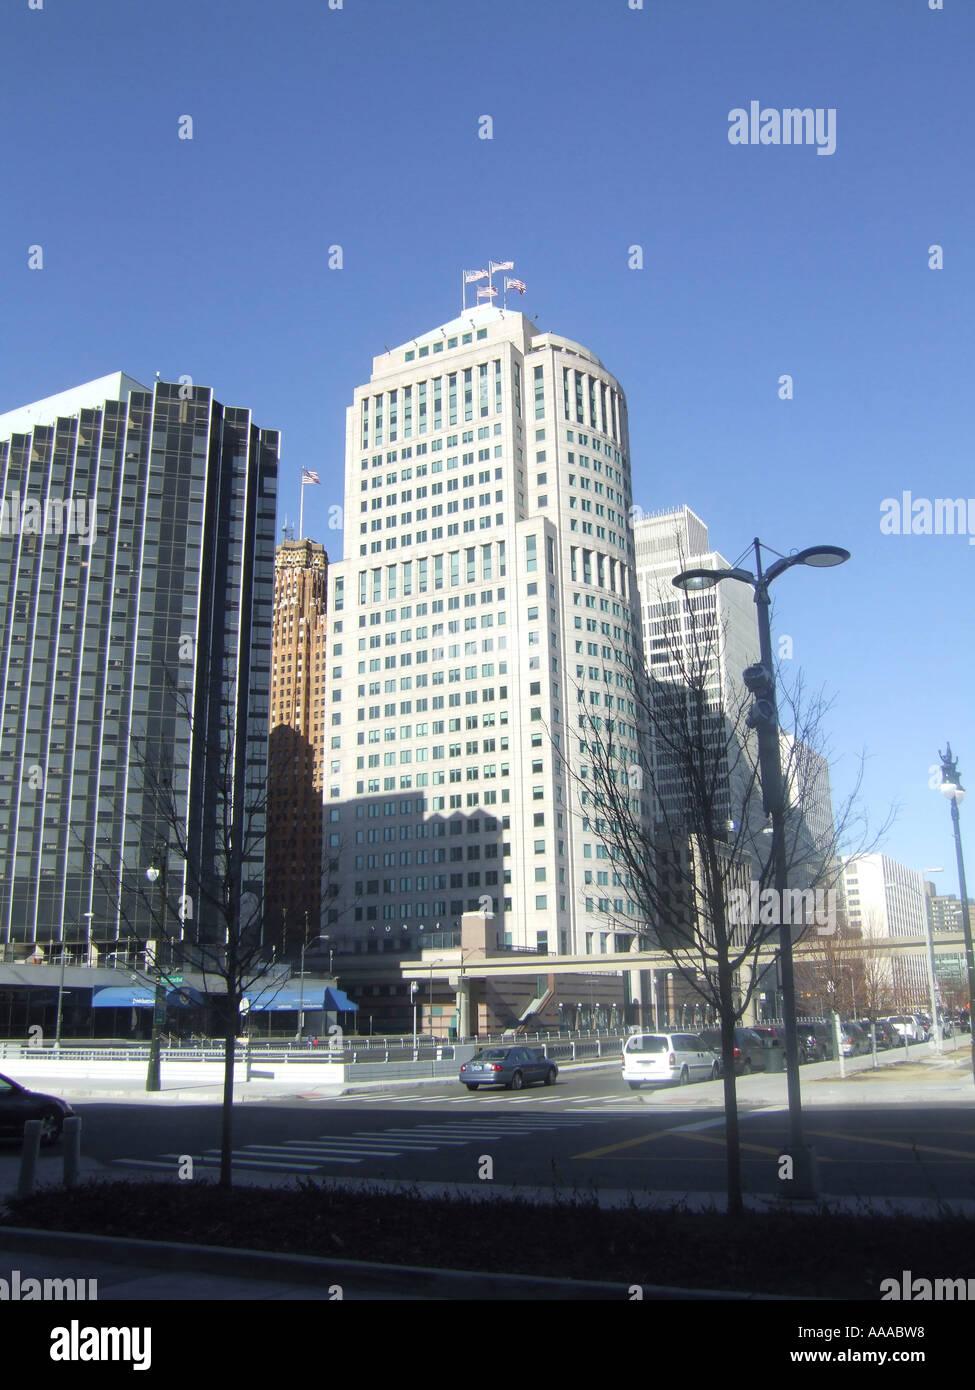 Ponchatrain Hotel Motel Downtown Detroit Michigan Mi Stock Photo